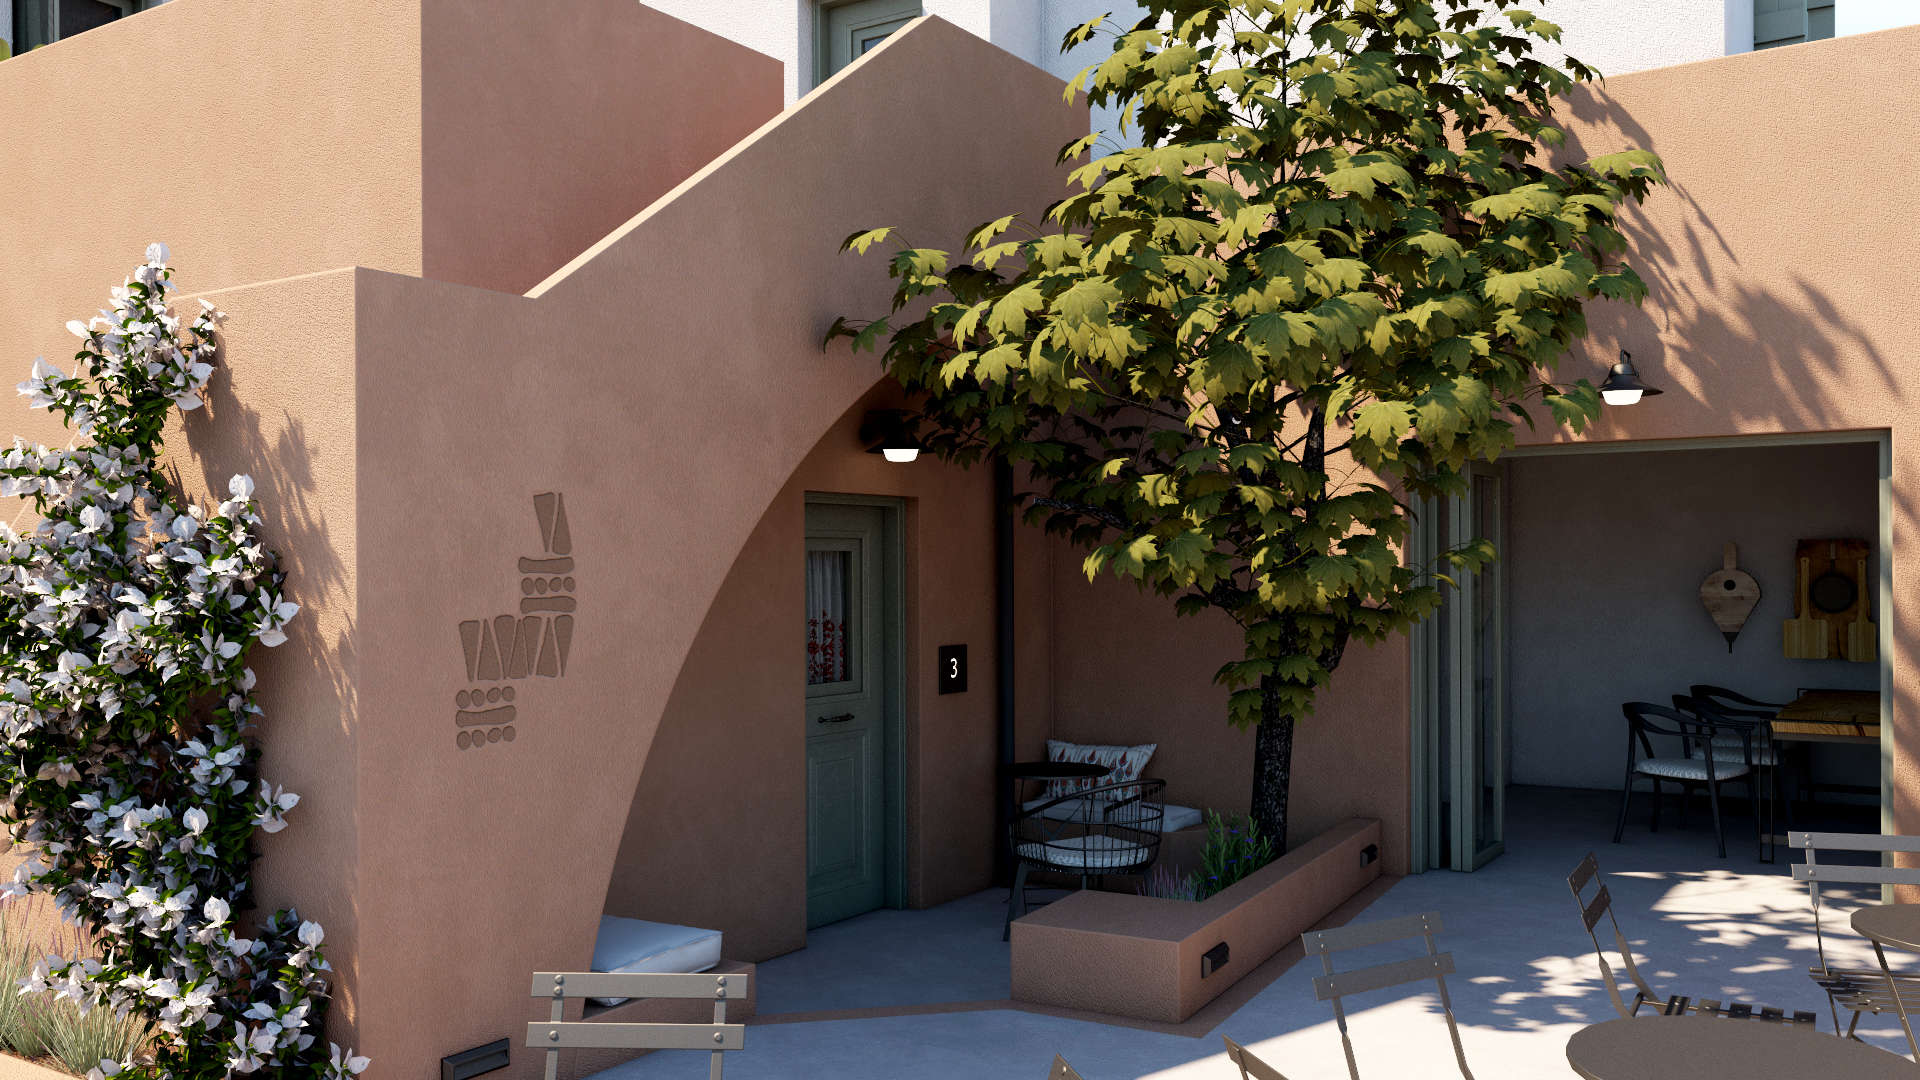 Hotel in a village, exterior design, sitting area, room entrance, facade. Τουριστικό κατάλυμα σε οικισμό, εξωτερικές διαμορφώσεις, καθιστικό, όψη, είσοδος δωματίου.